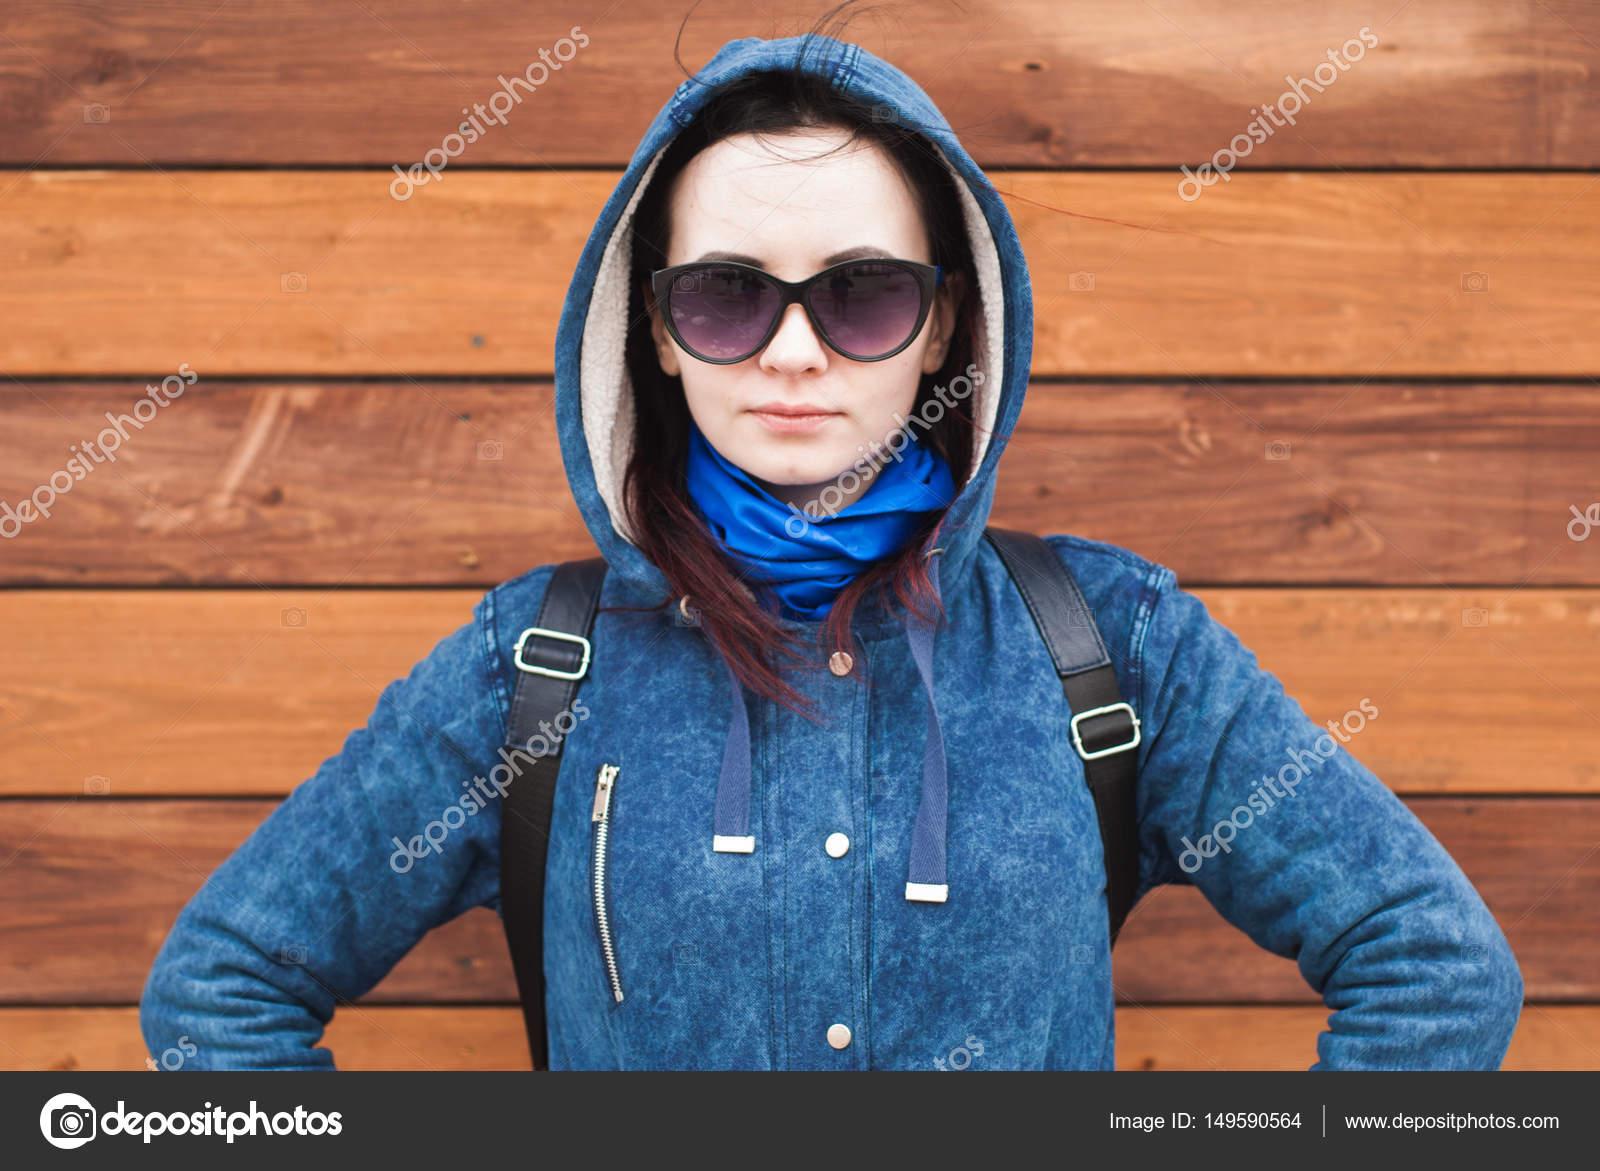 304fd2931b Κορίτσι με ένα μπλε μπουφάν με κουκούλα